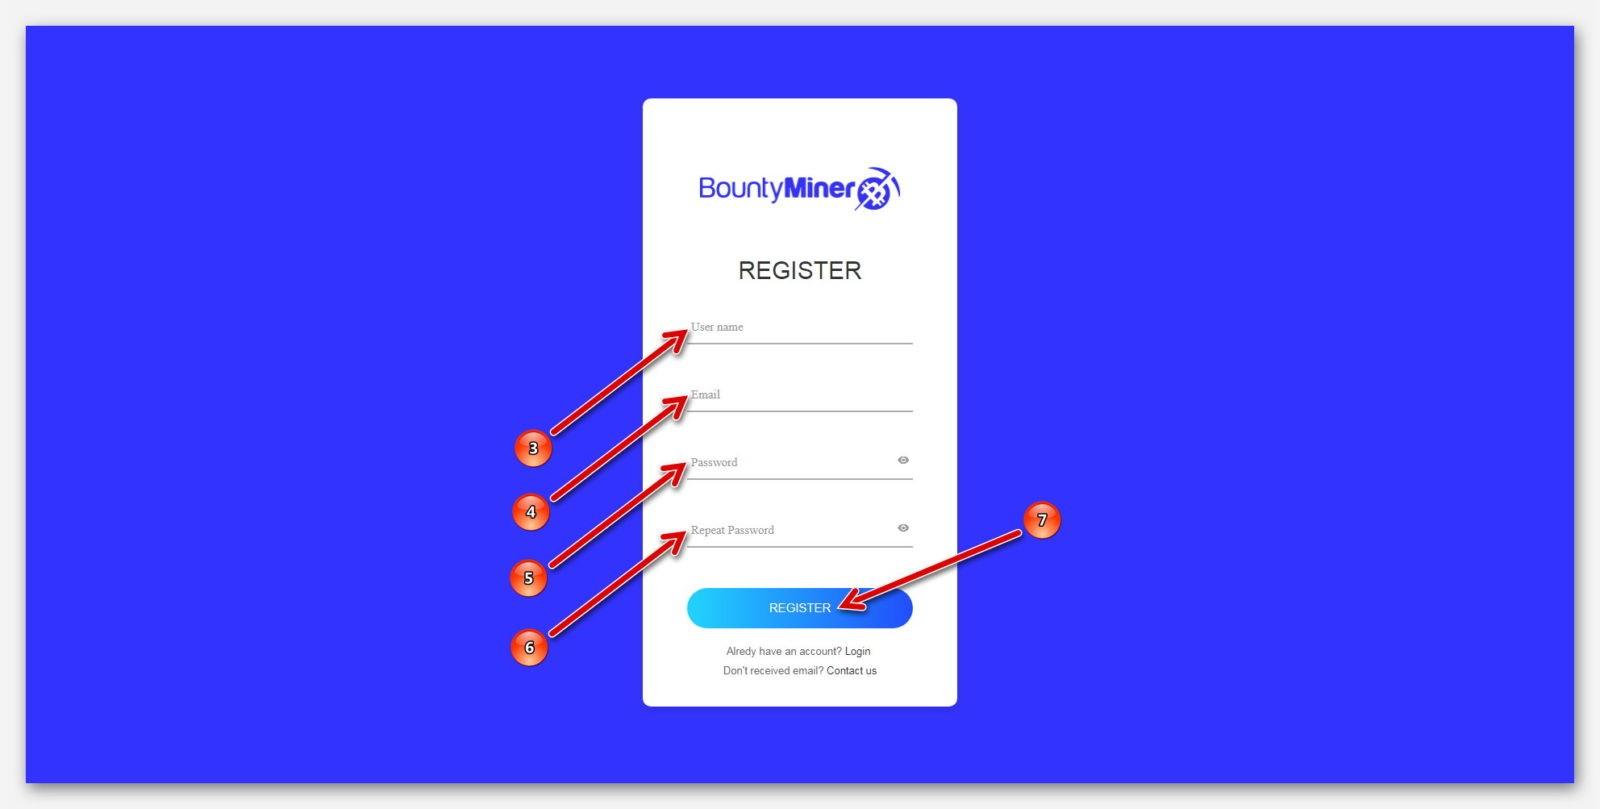 Страница регистрации, на платформе BountyMiner